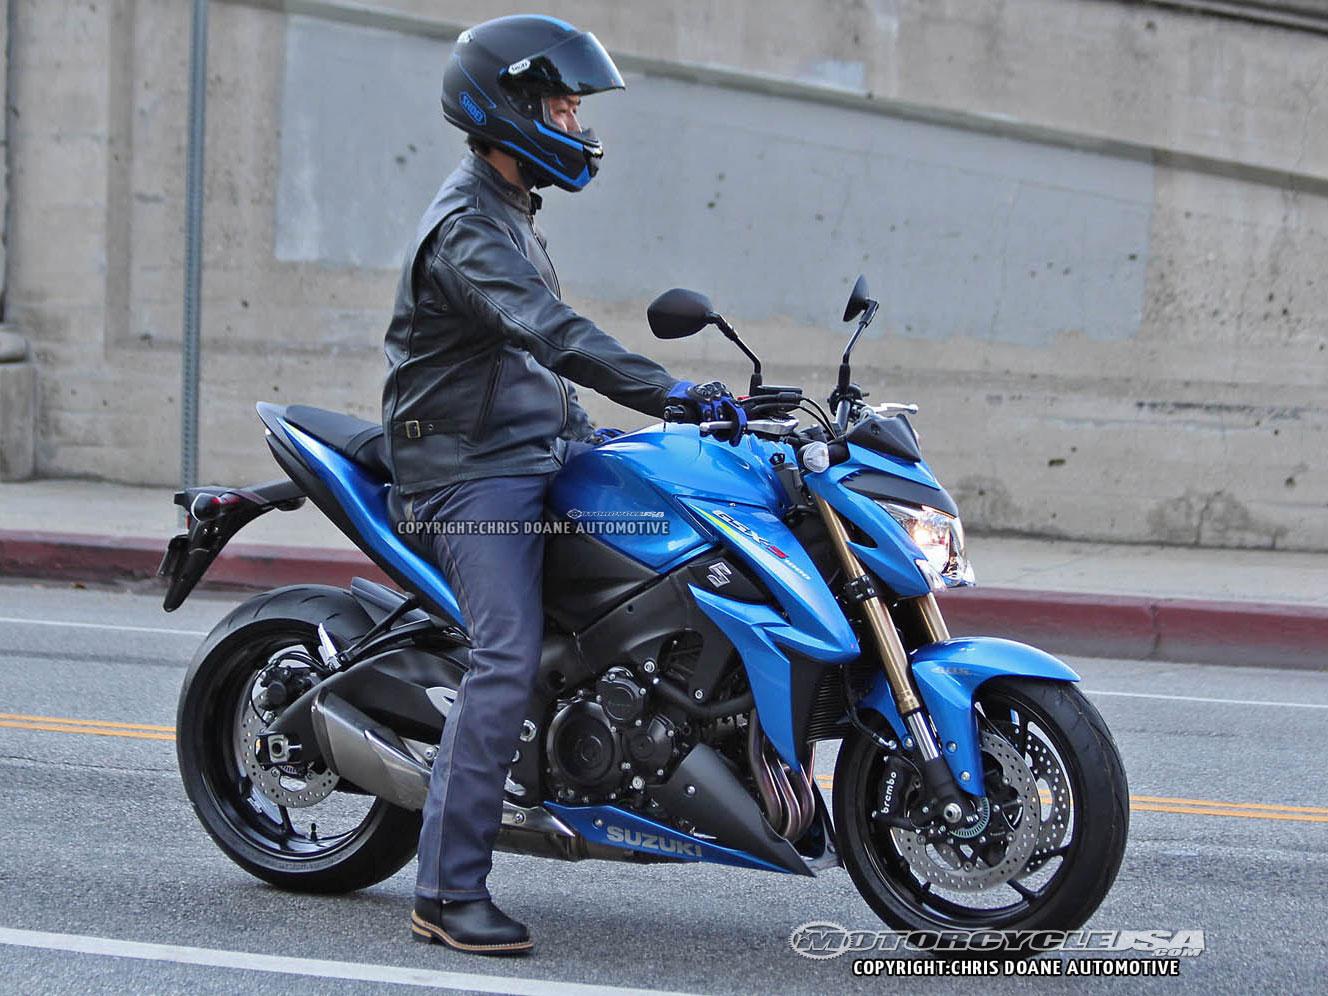 hight resolution of 2015 suzuki suzuki gsx s1000 l6 abs for sale in granby ma allpower 413 467 3499